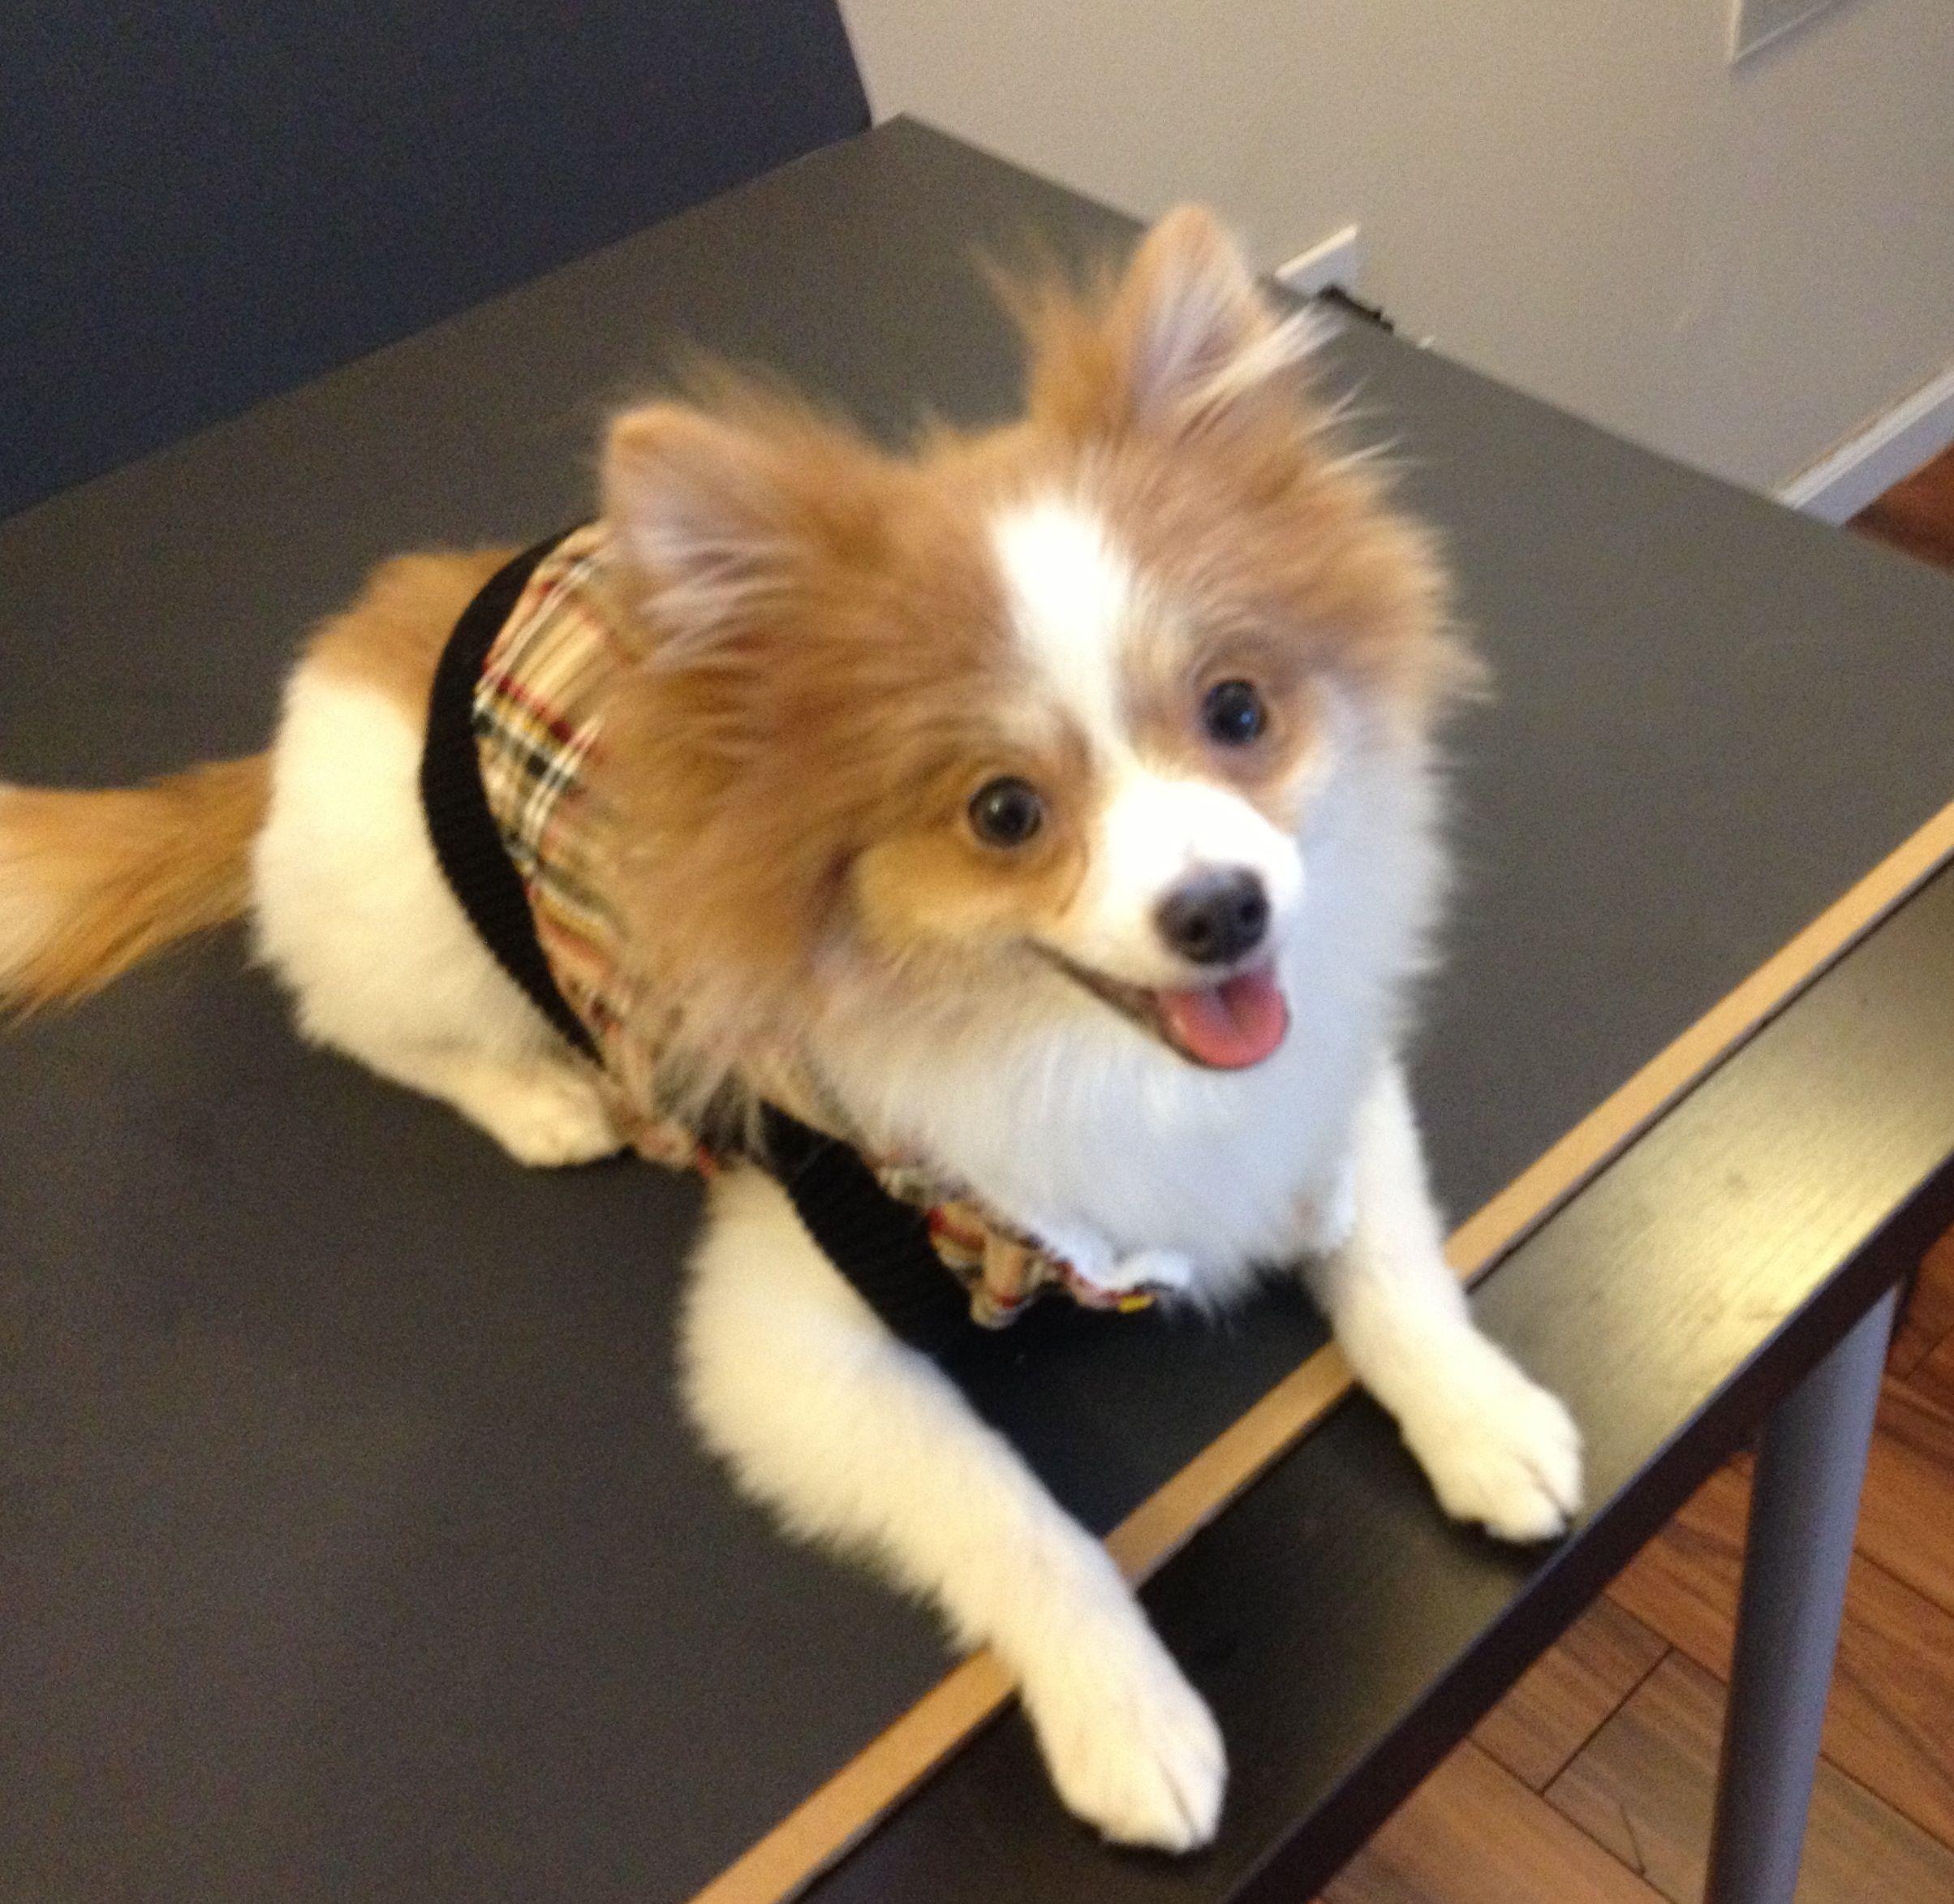 Plaid Hooded Dog Jacket | Pets | Pinterest | Dogs, Cute ...